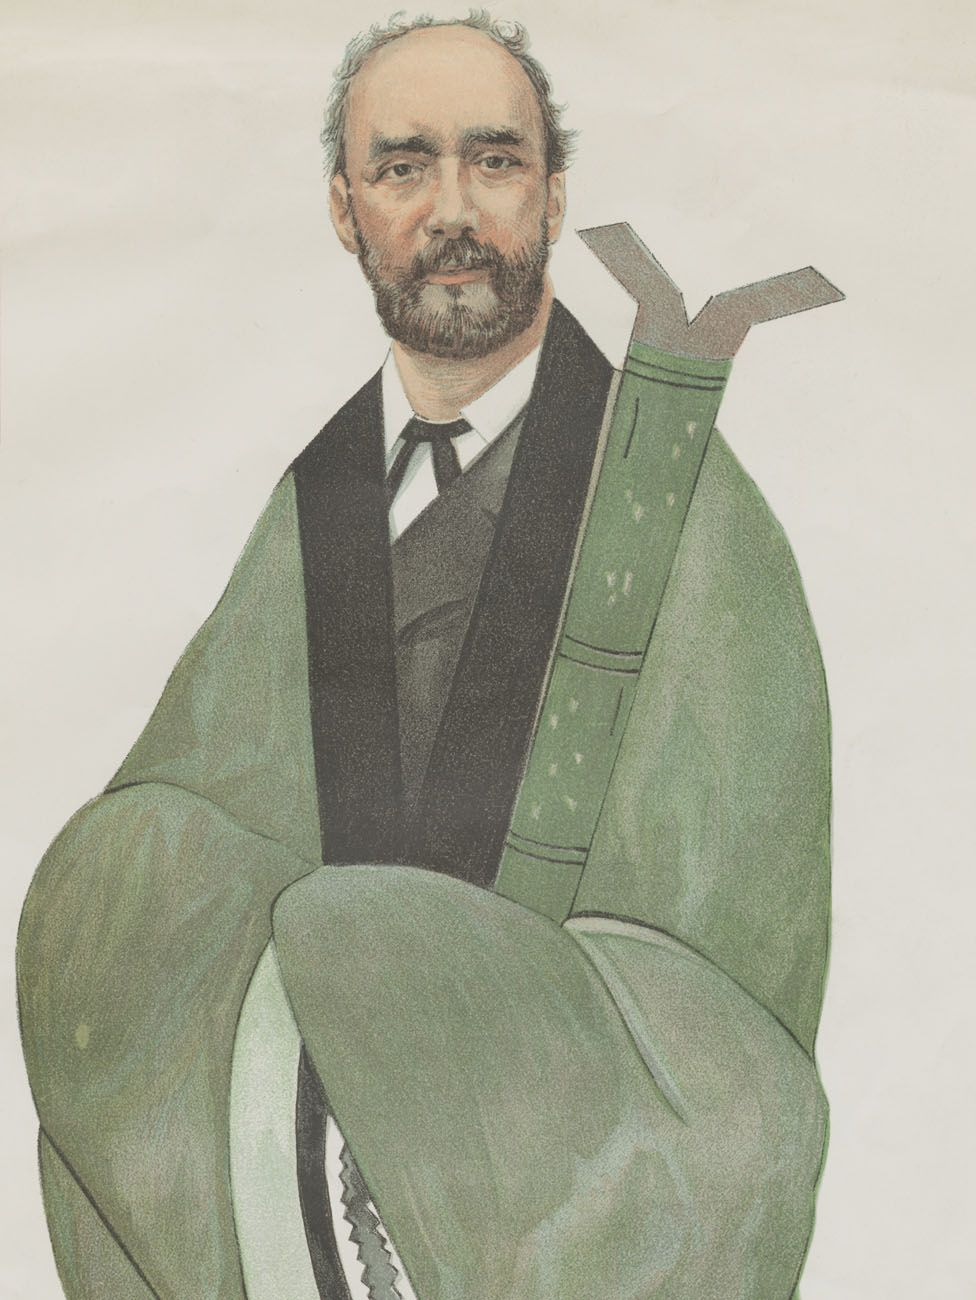 Sir Robert Hart, caricatured in the magazine Vanity Fair, December 1894